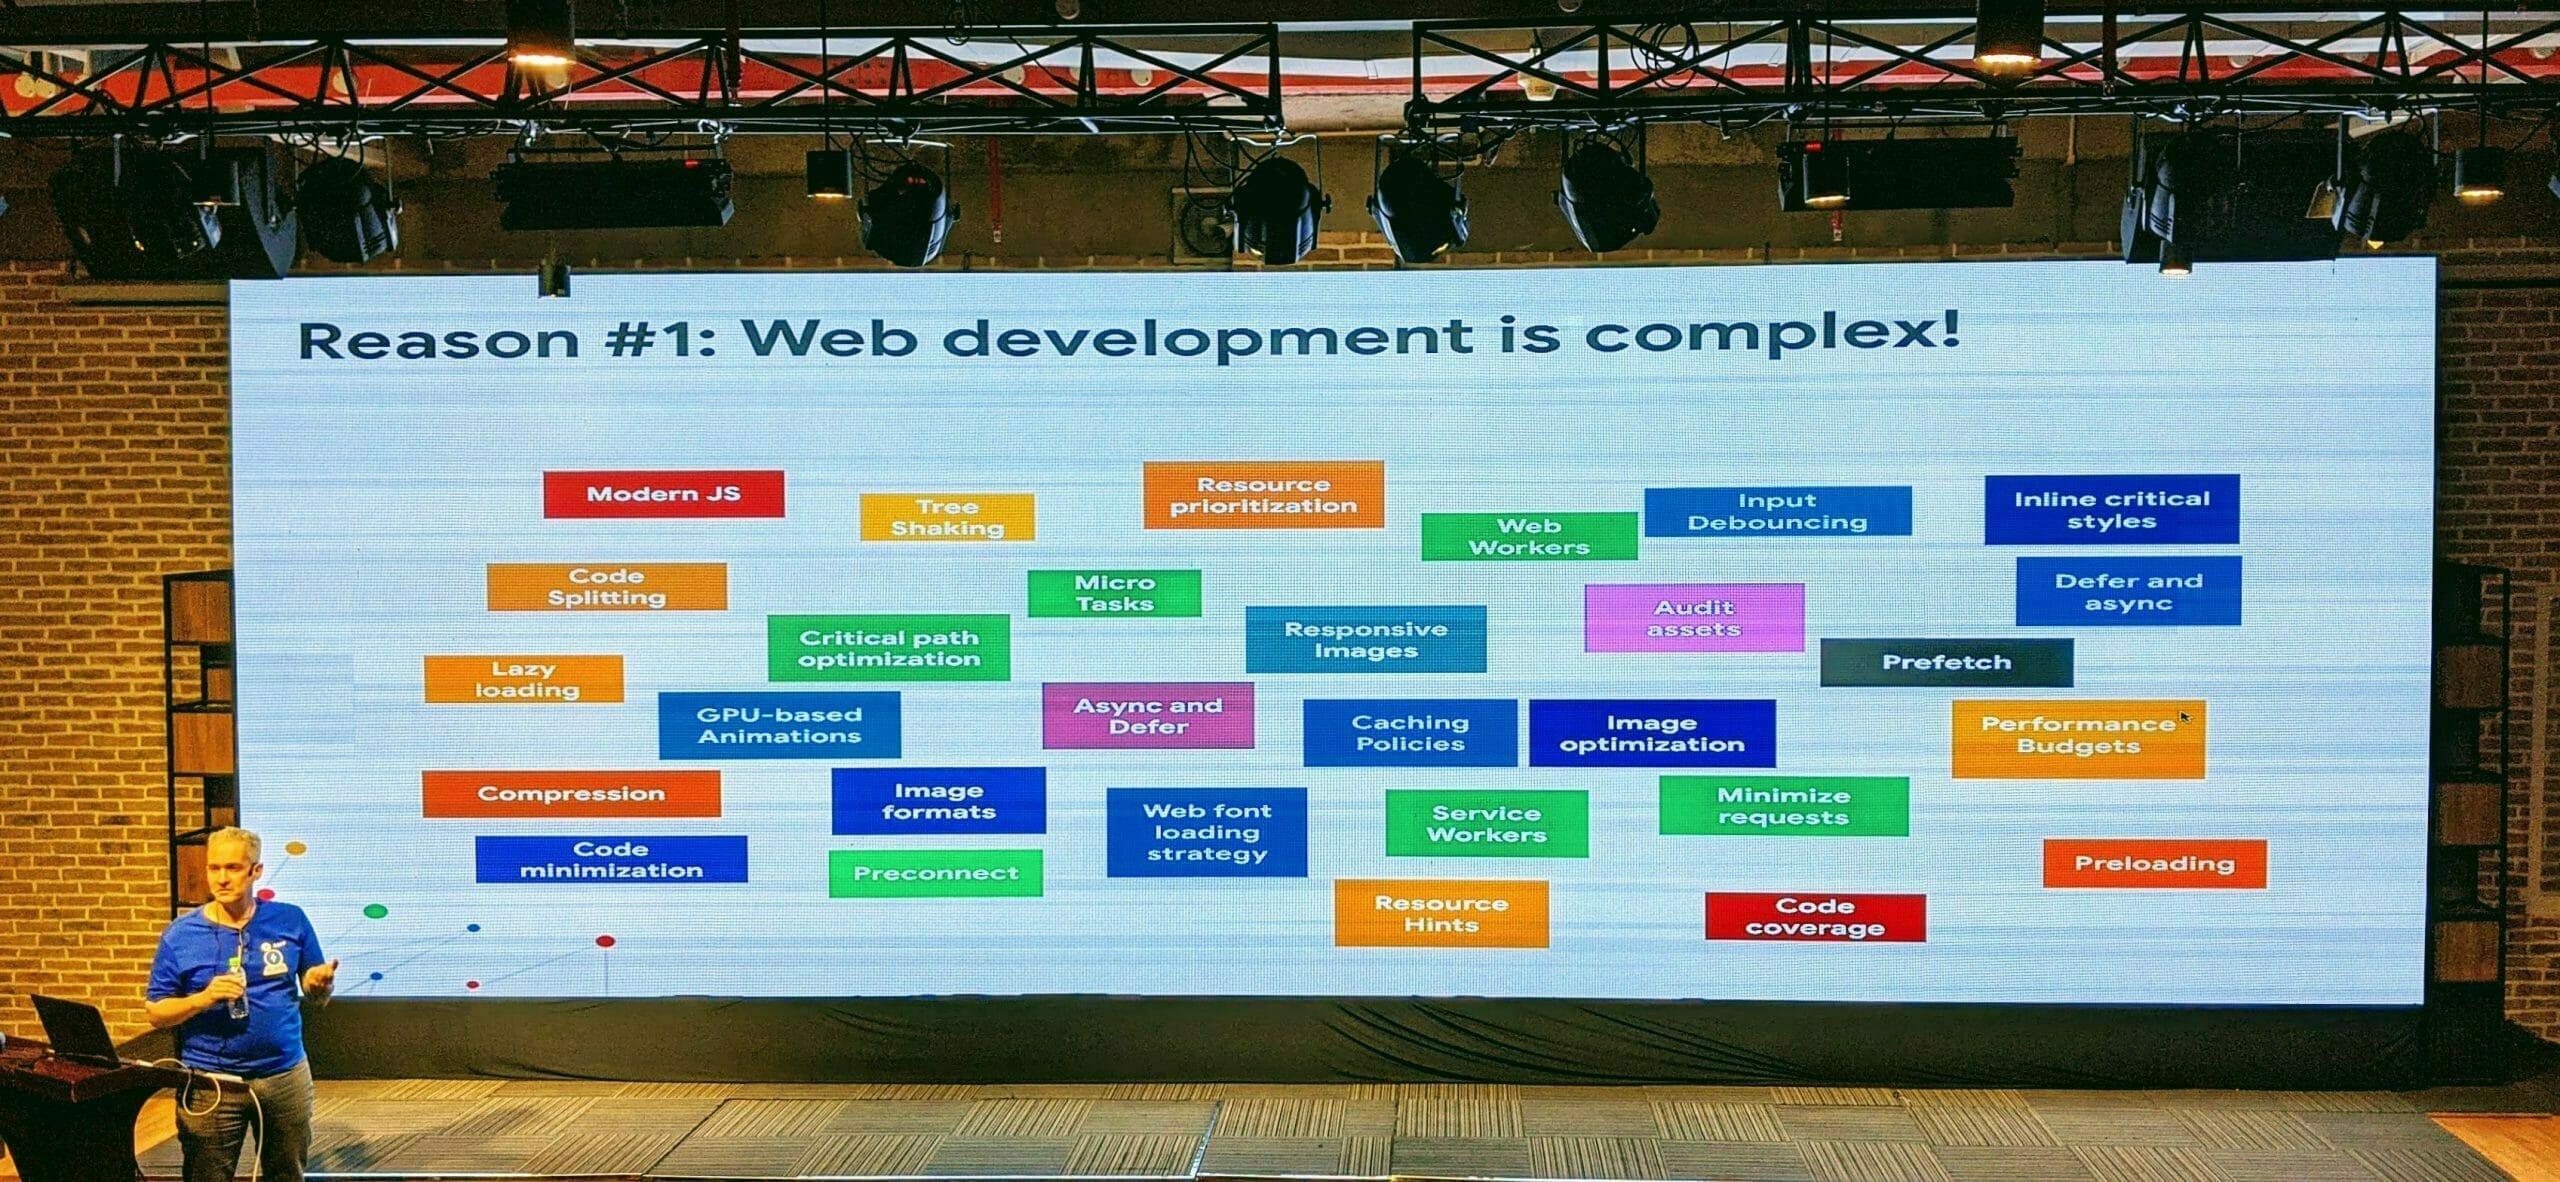 Google for WordPress Publisher tại HCM:理由その1